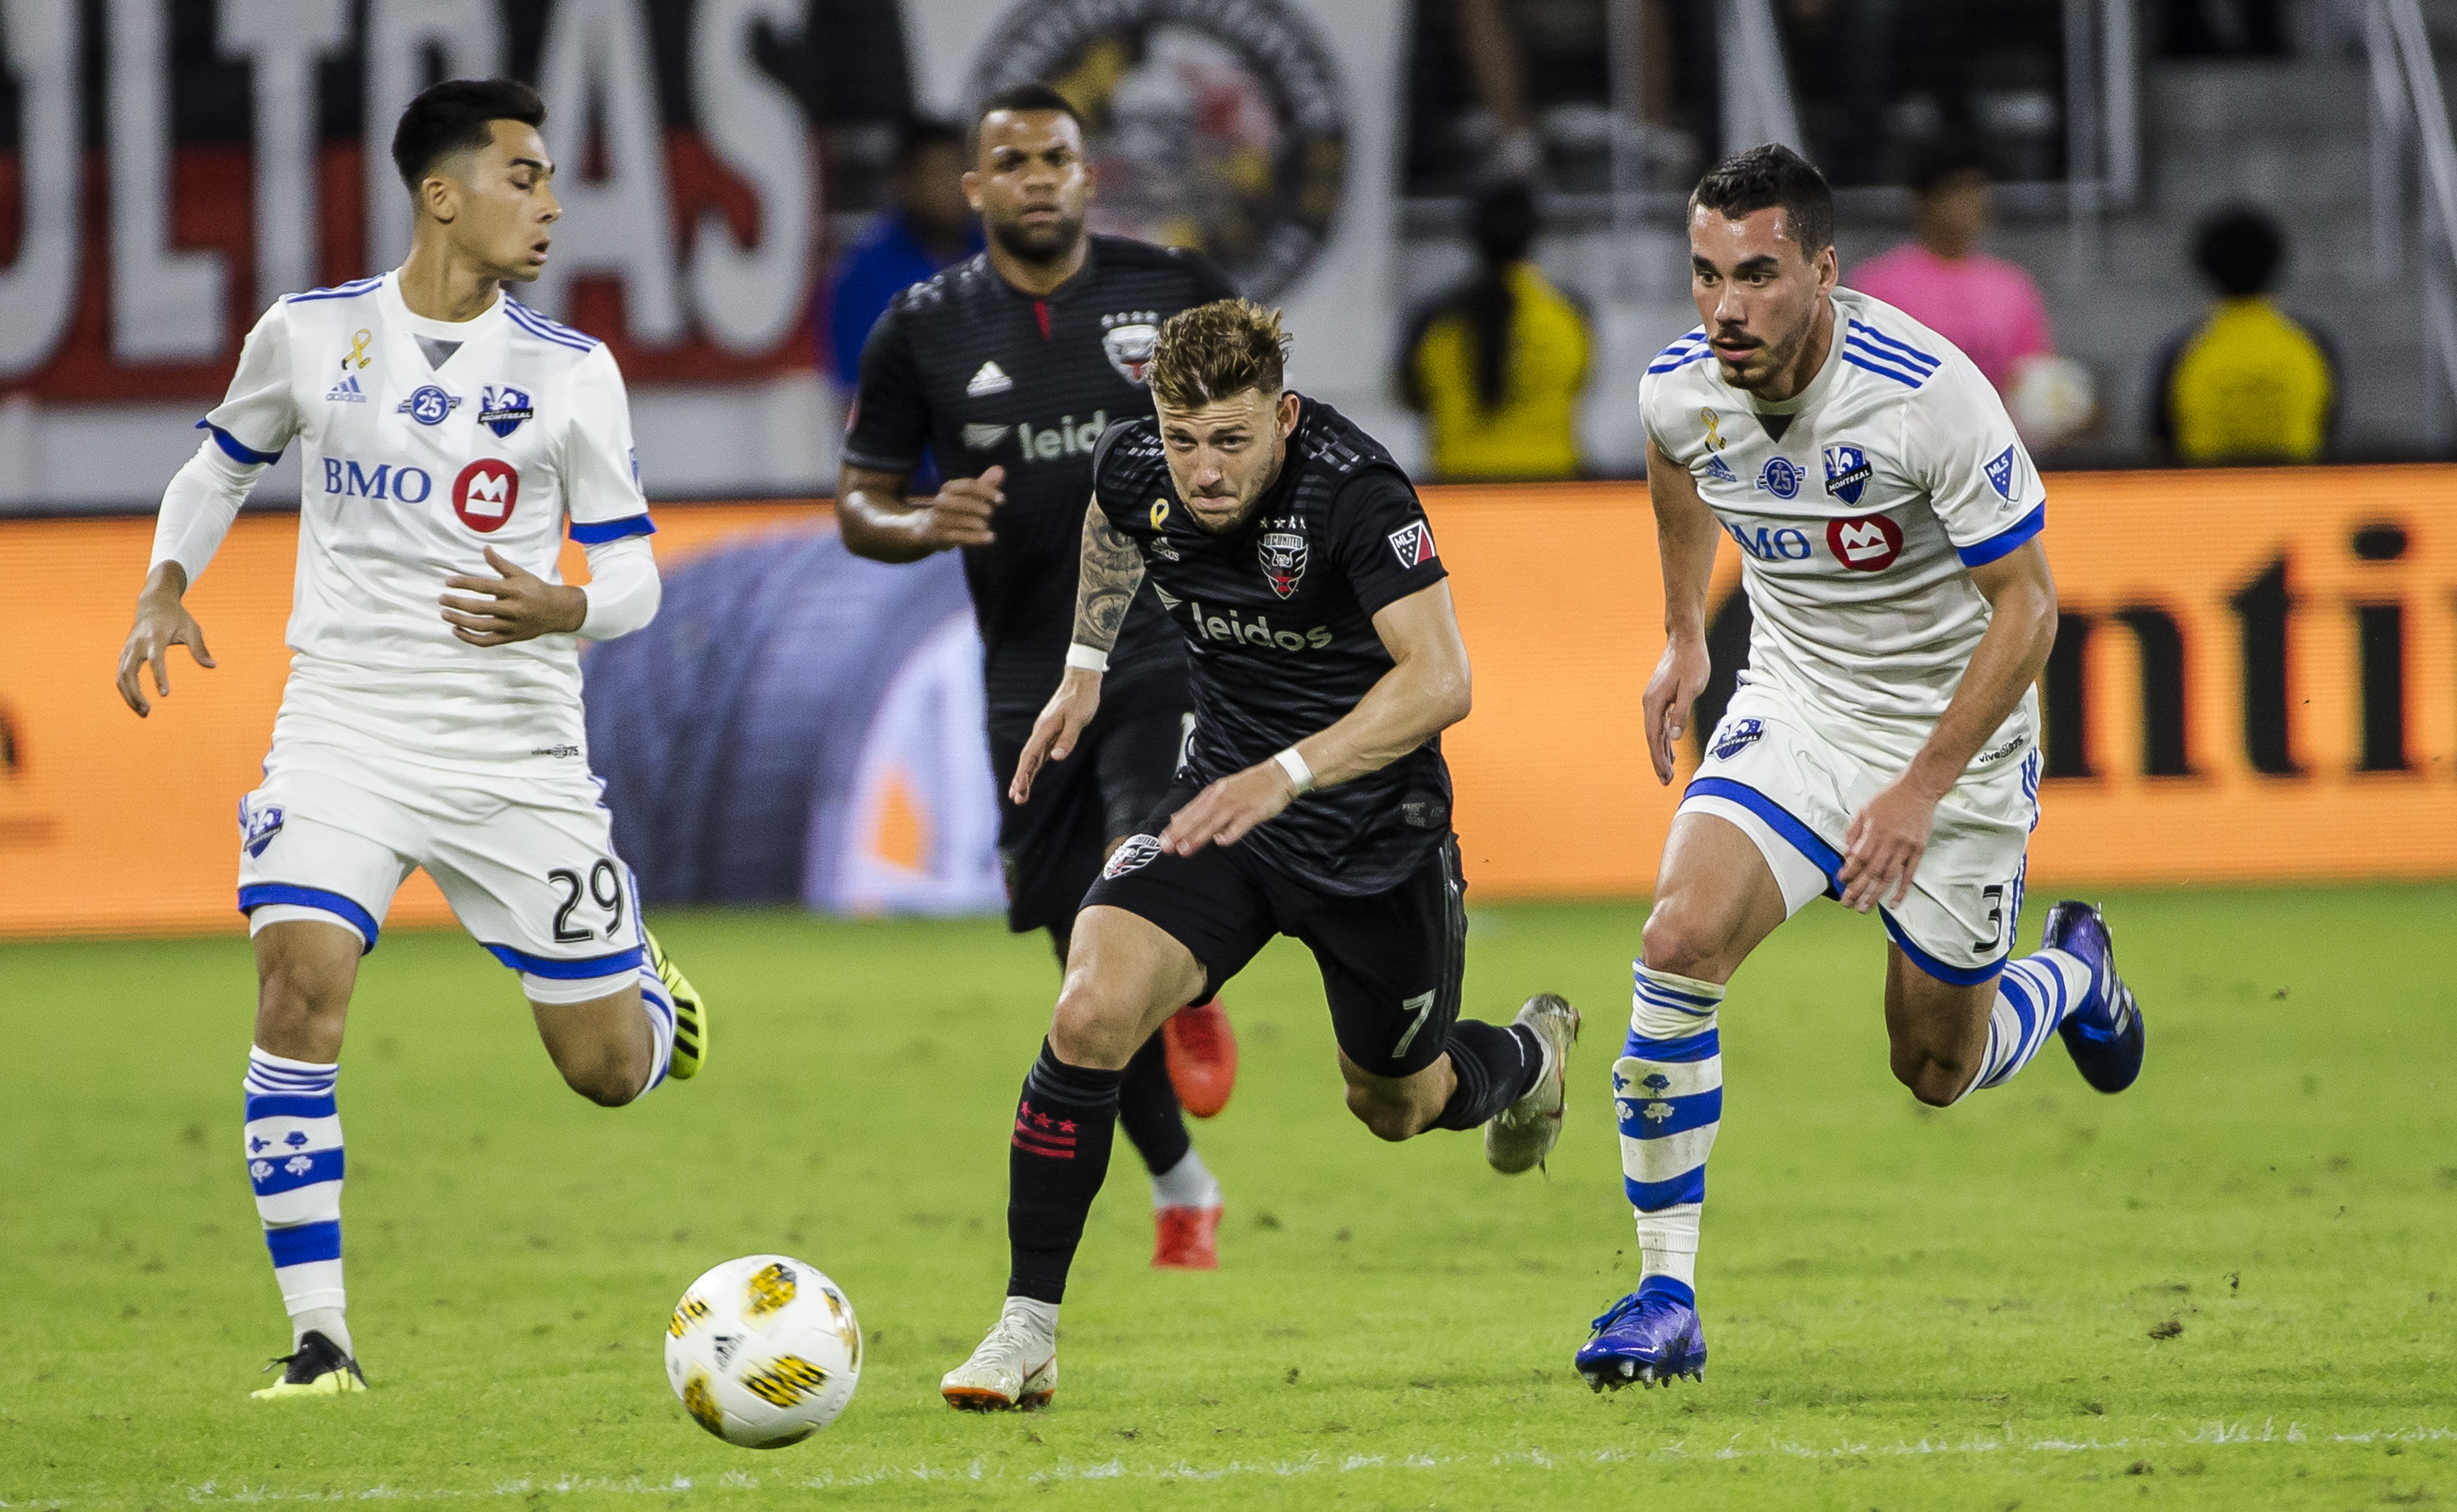 SOCCER: SEP 29 MLS - Montreal Impact at DC United